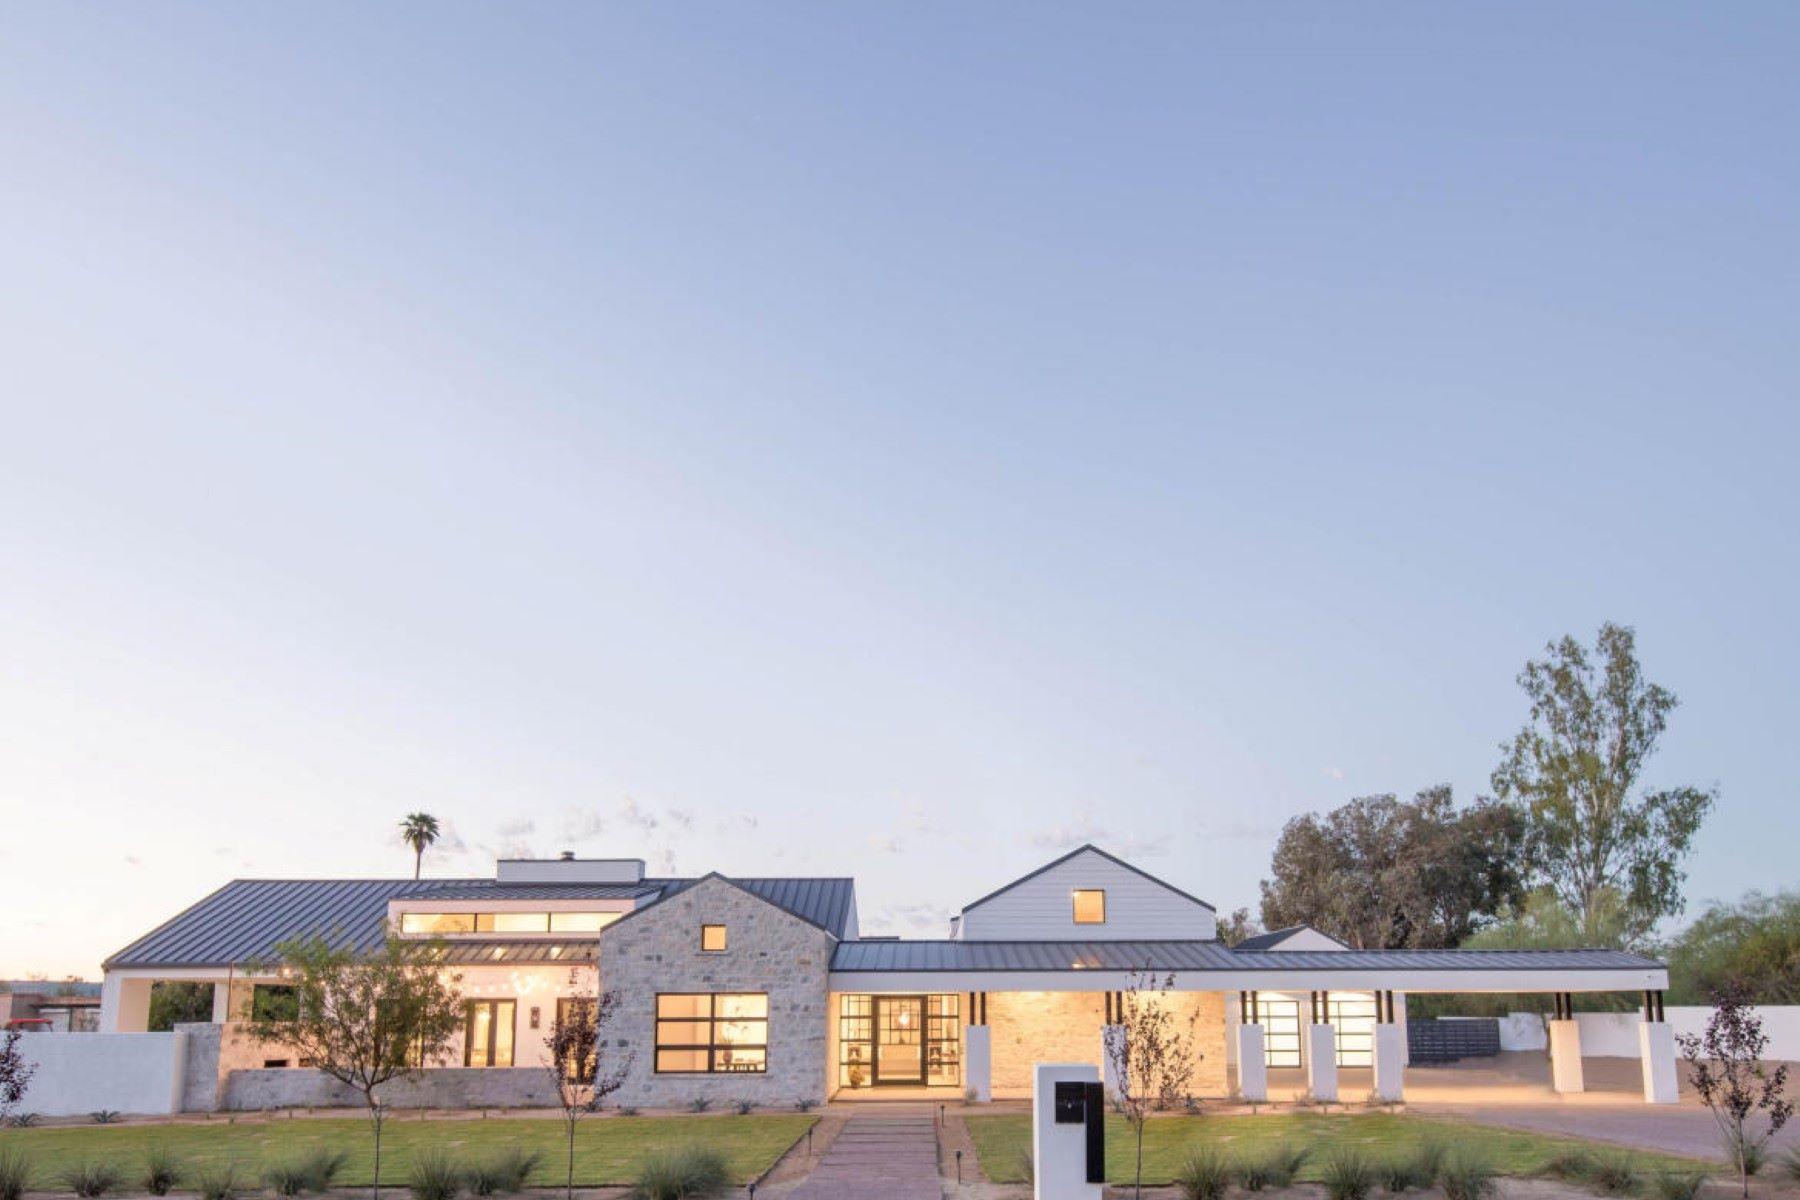 Casa Unifamiliar por un Venta en Incredible Modern Farmhouse 3253 E San Miguel Pl Paradise Valley, Arizona, 85253 Estados Unidos